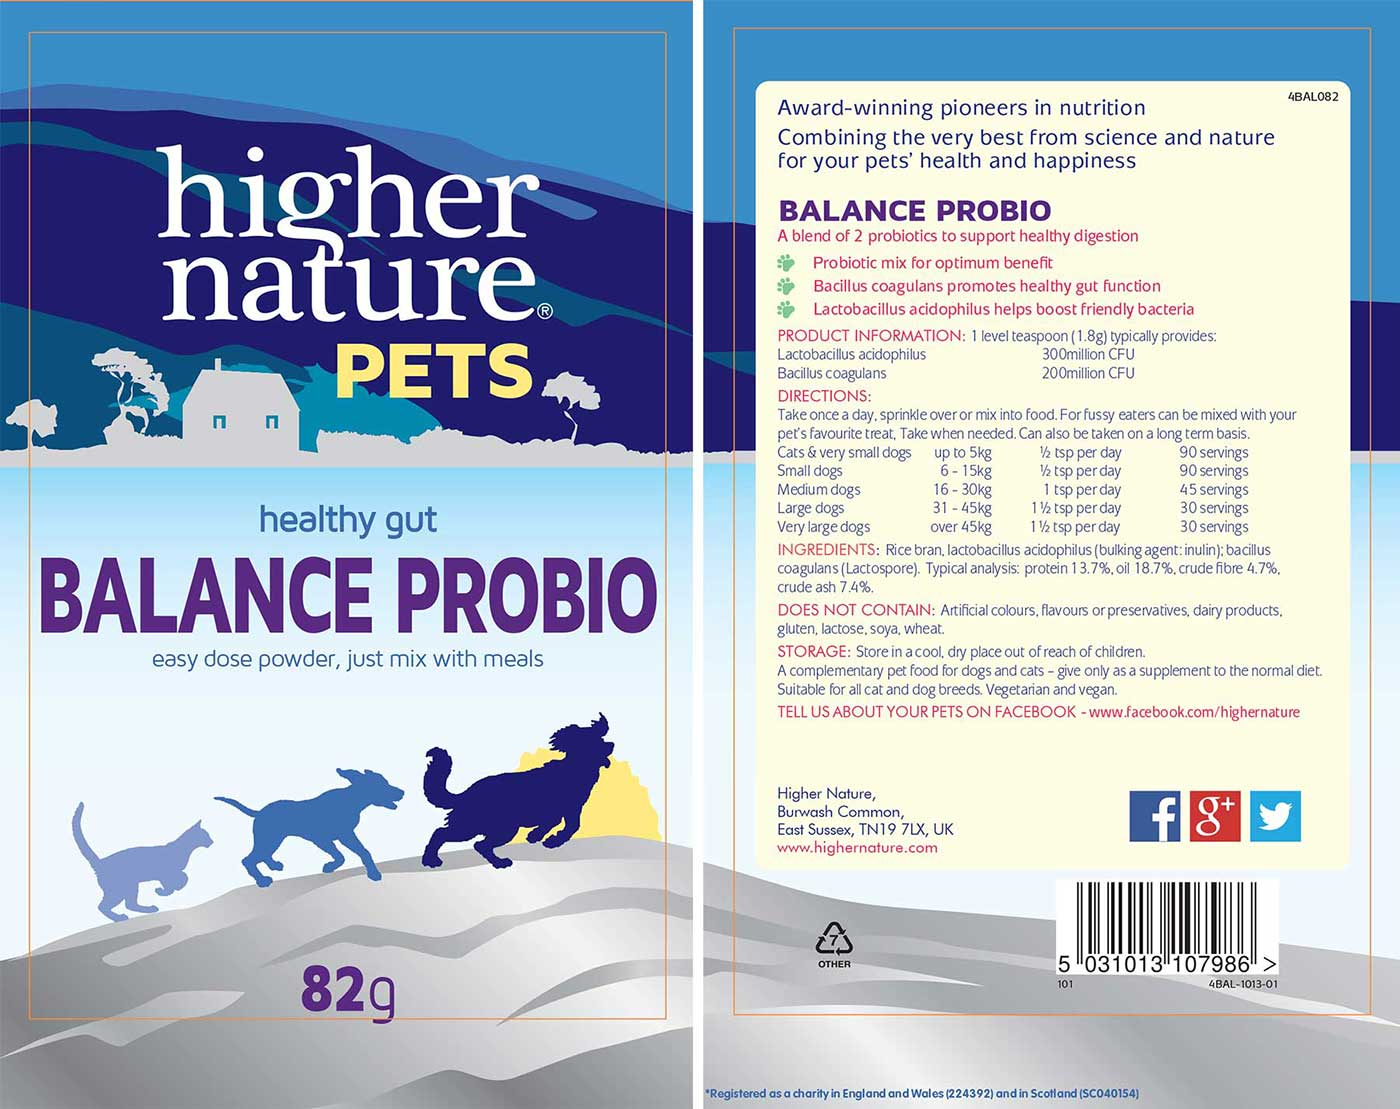 Higher Nature Balance Probio A Blend Of 2 Probiotics To